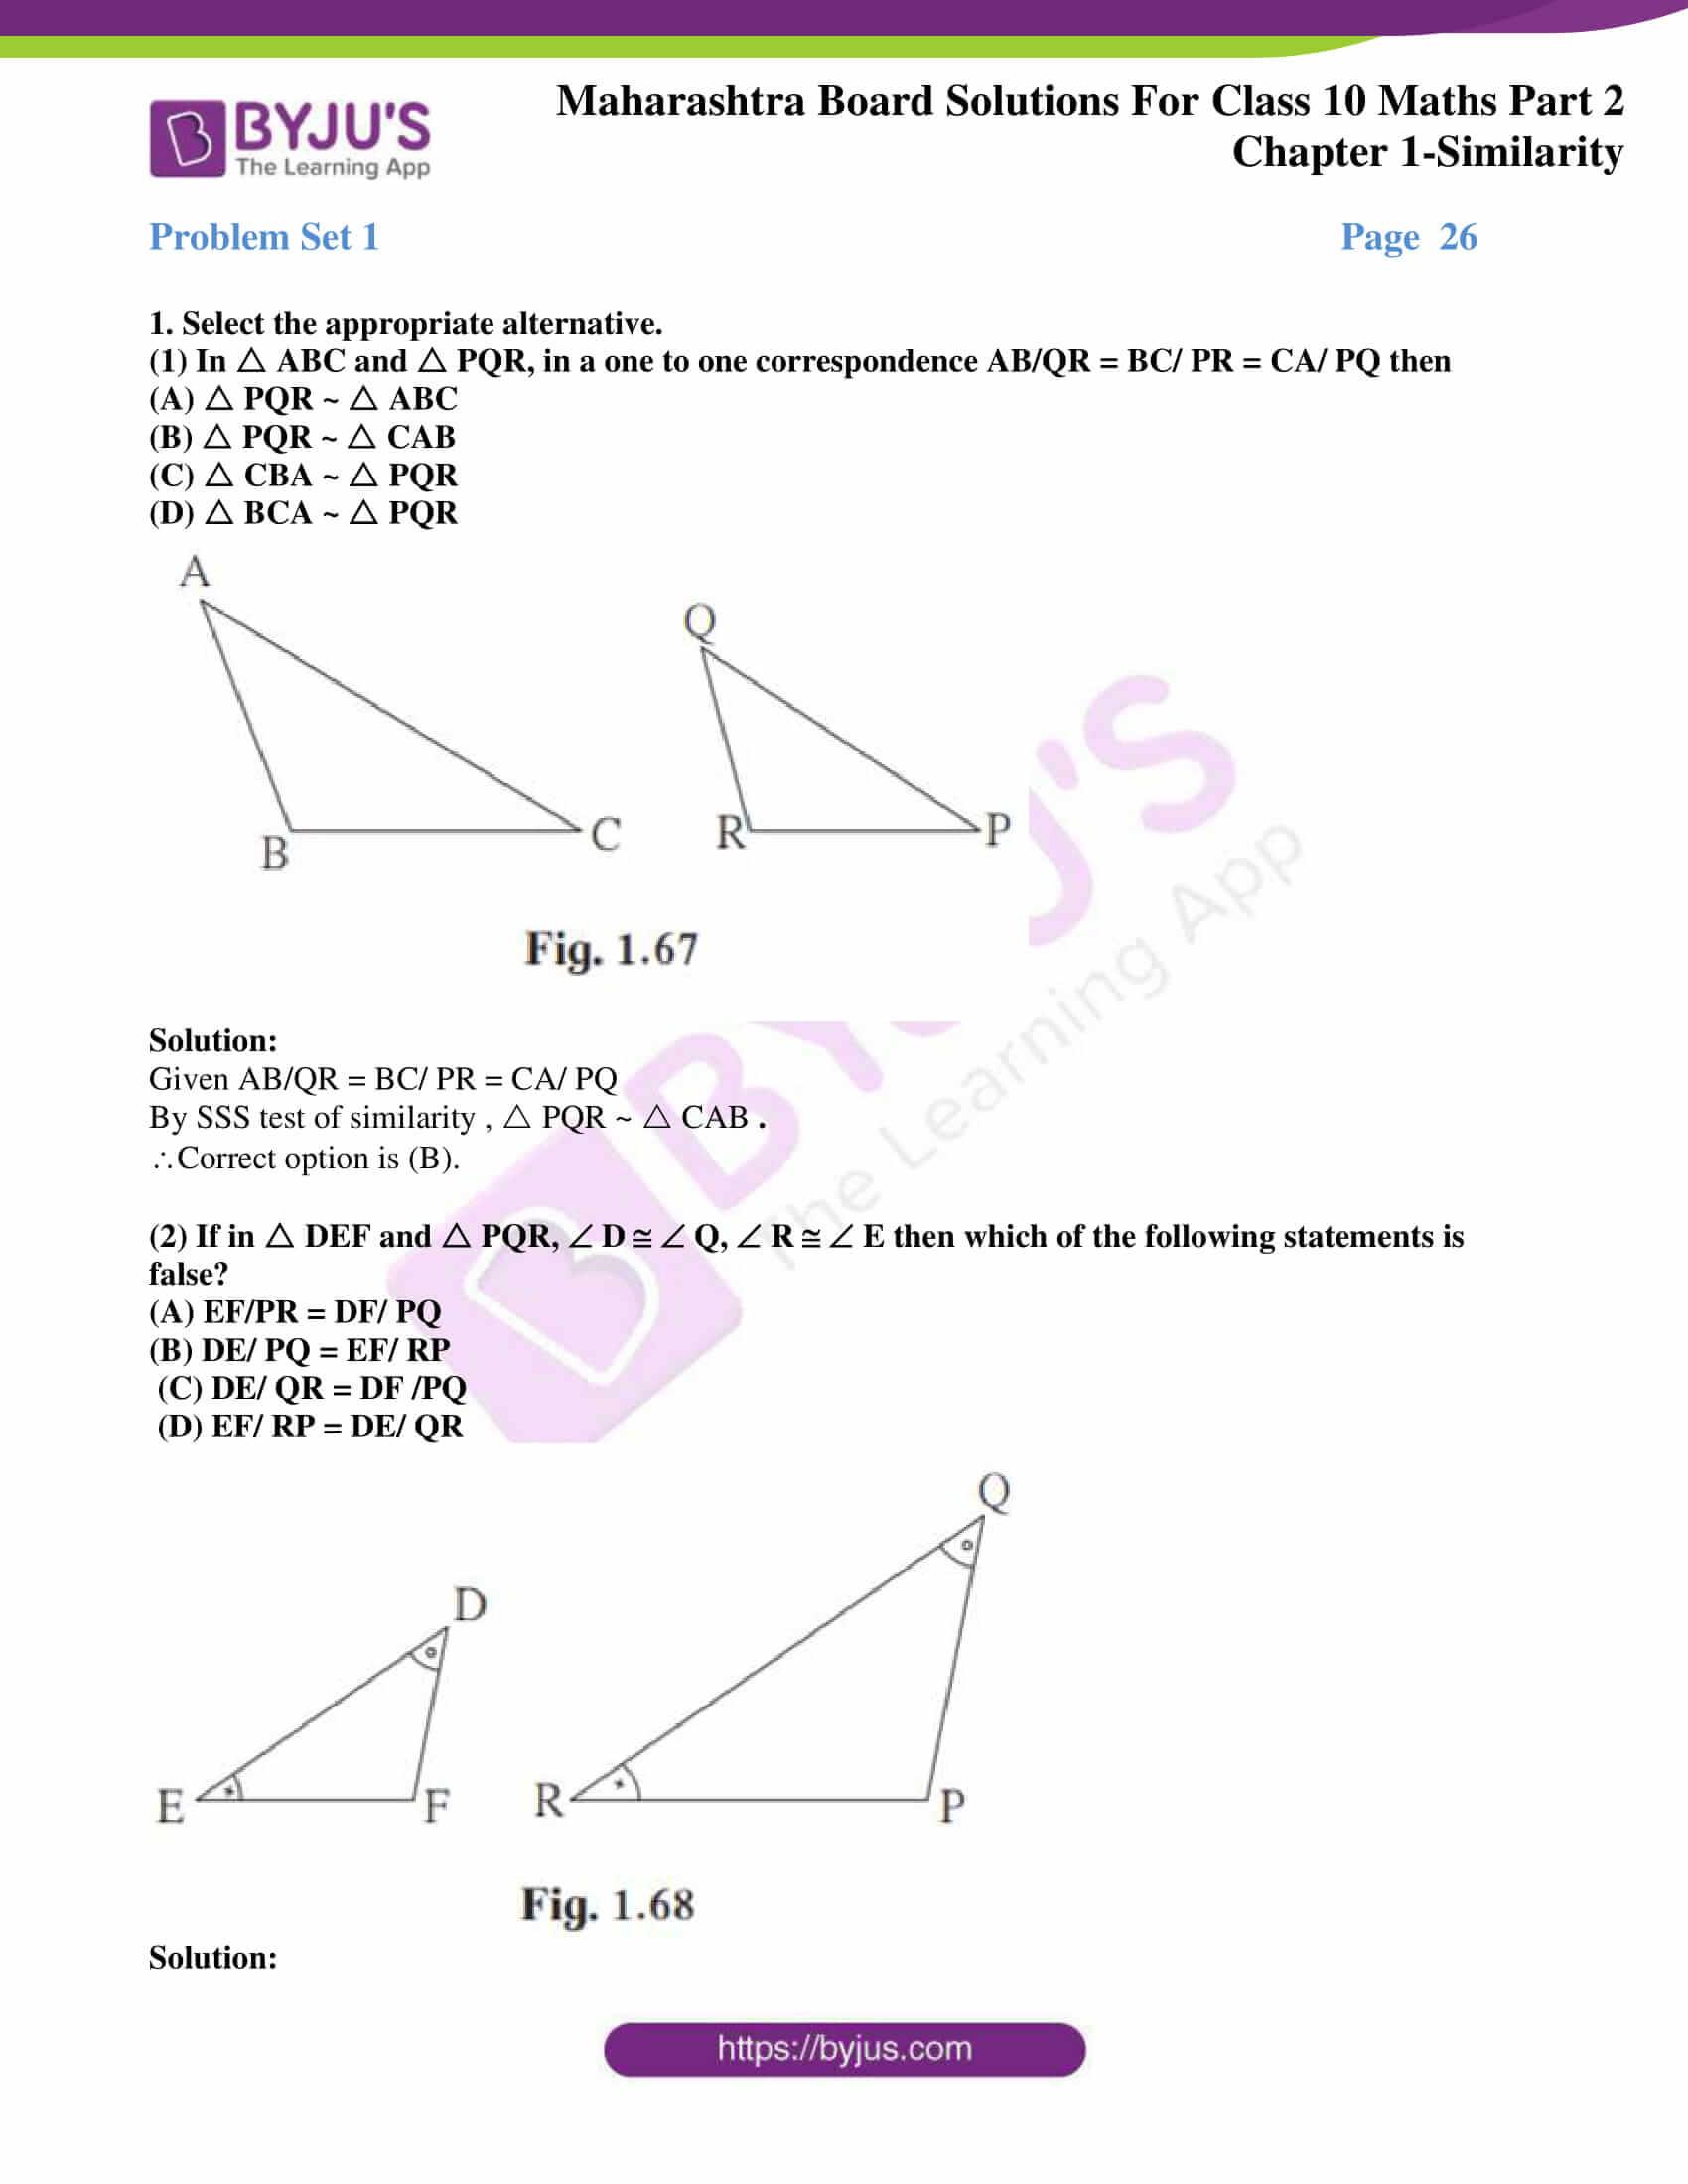 msbshse sol class 10 maths part 2 chapter 1 18